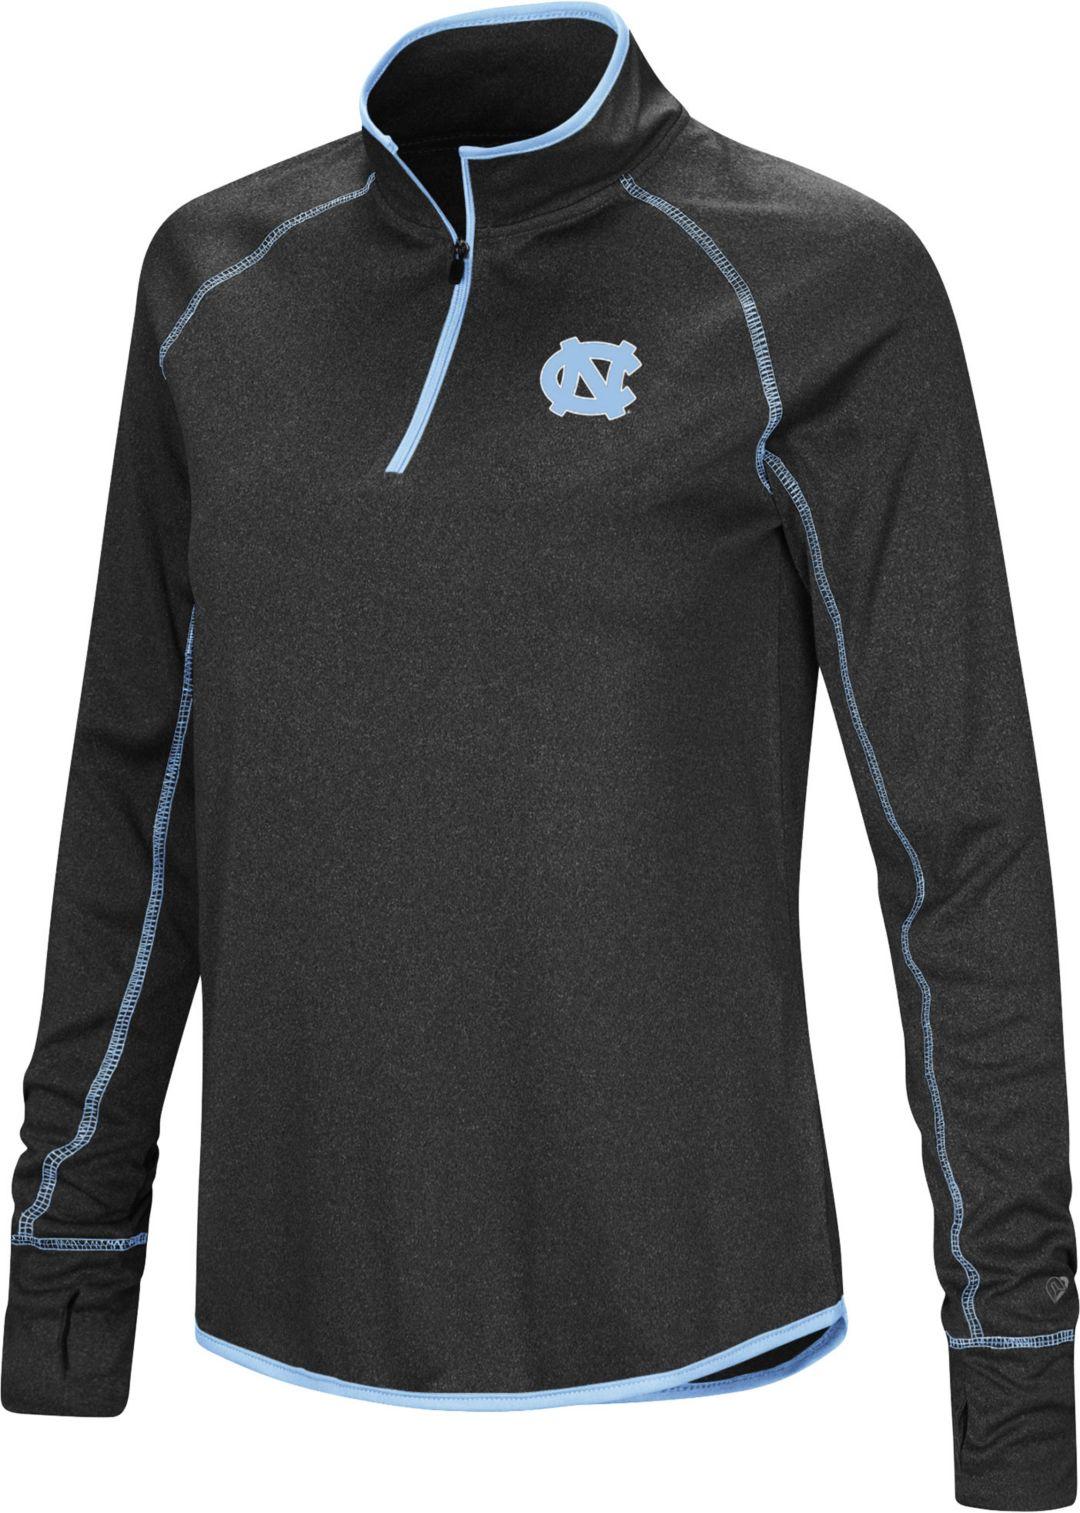 reputable site cc907 8b774 Colosseum Women's North Carolina Tar Heels Stingray Quarter-Zip Black Shirt